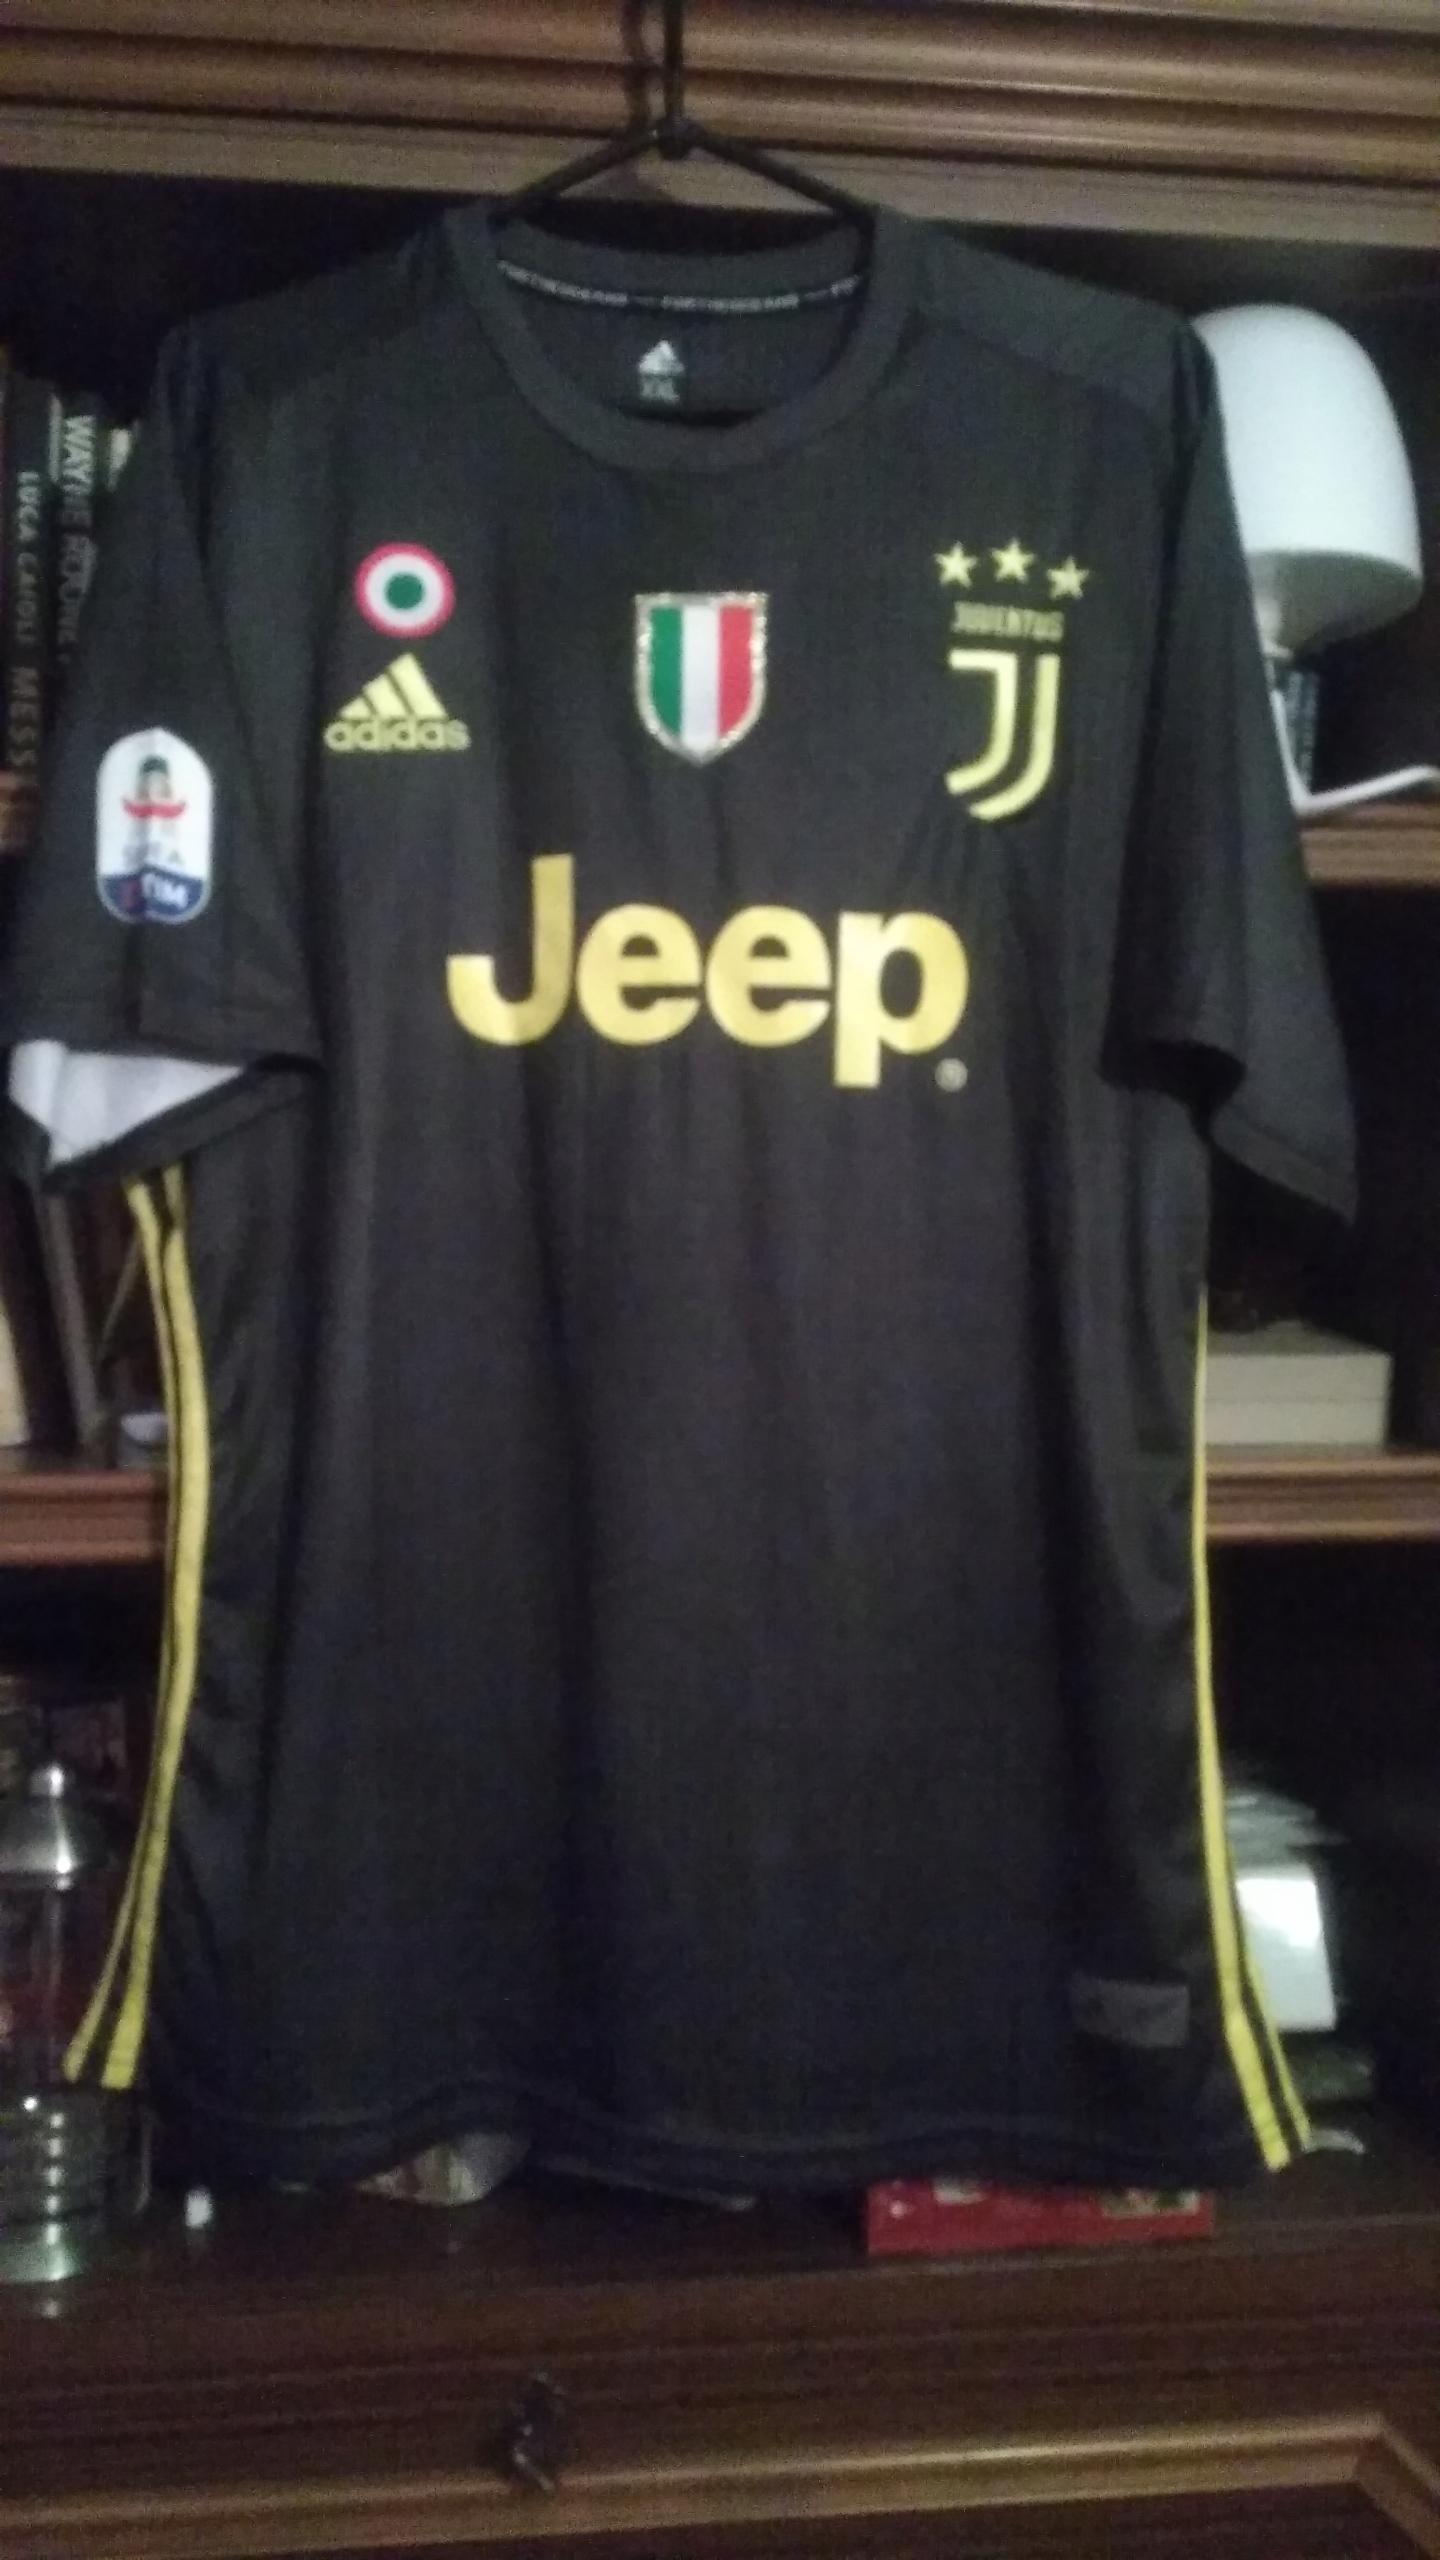 6157a3c88 Koszulka Juventus Turyn Paulo Dybala nr10 L/XL - 7661398322 ...